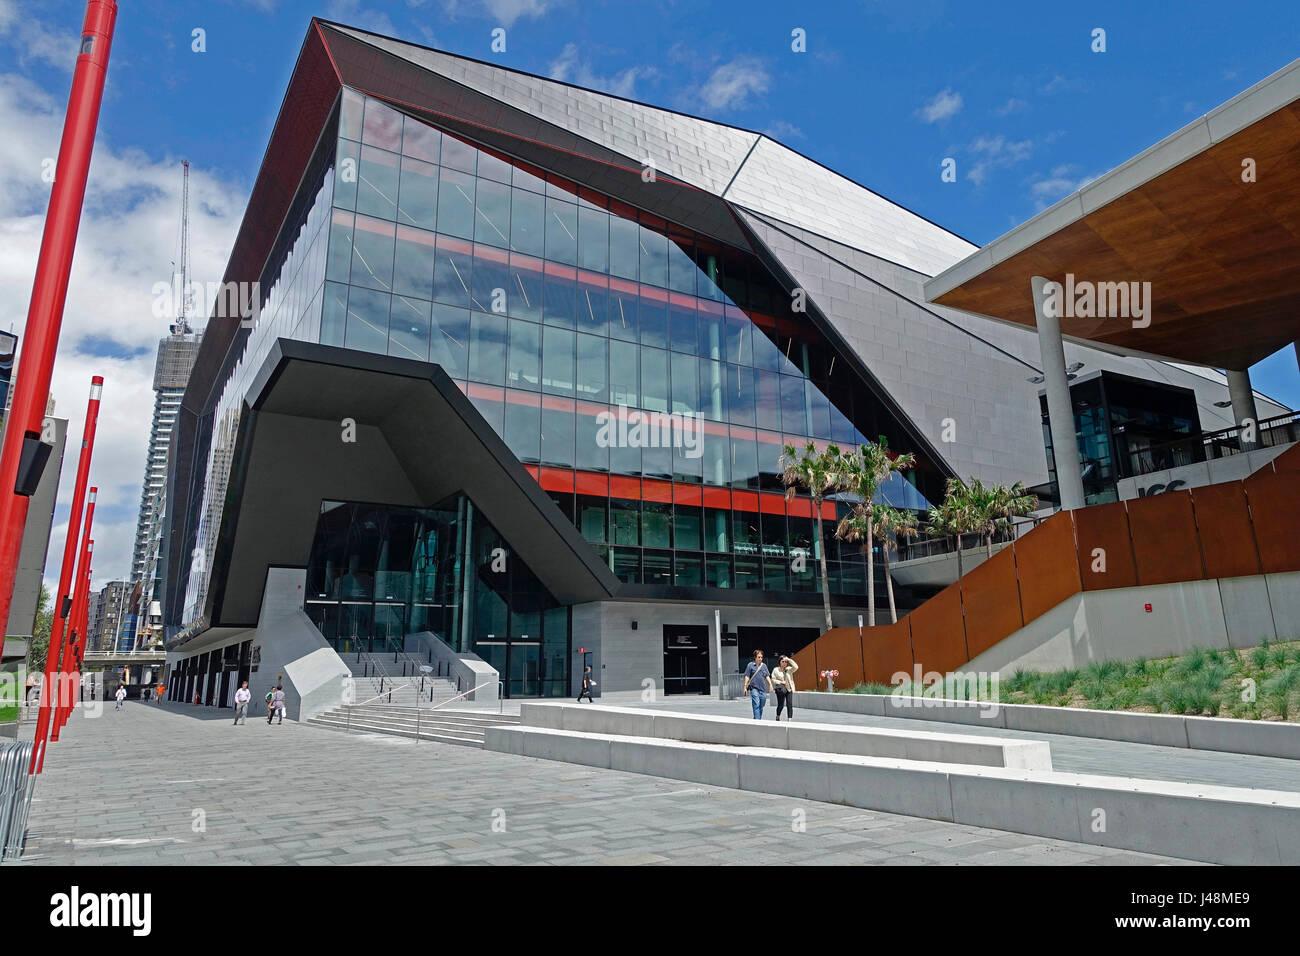 The ICC Sydney Theatre at The International Convention Centre Sydney (ICC Sydney), Australia - Stock Image